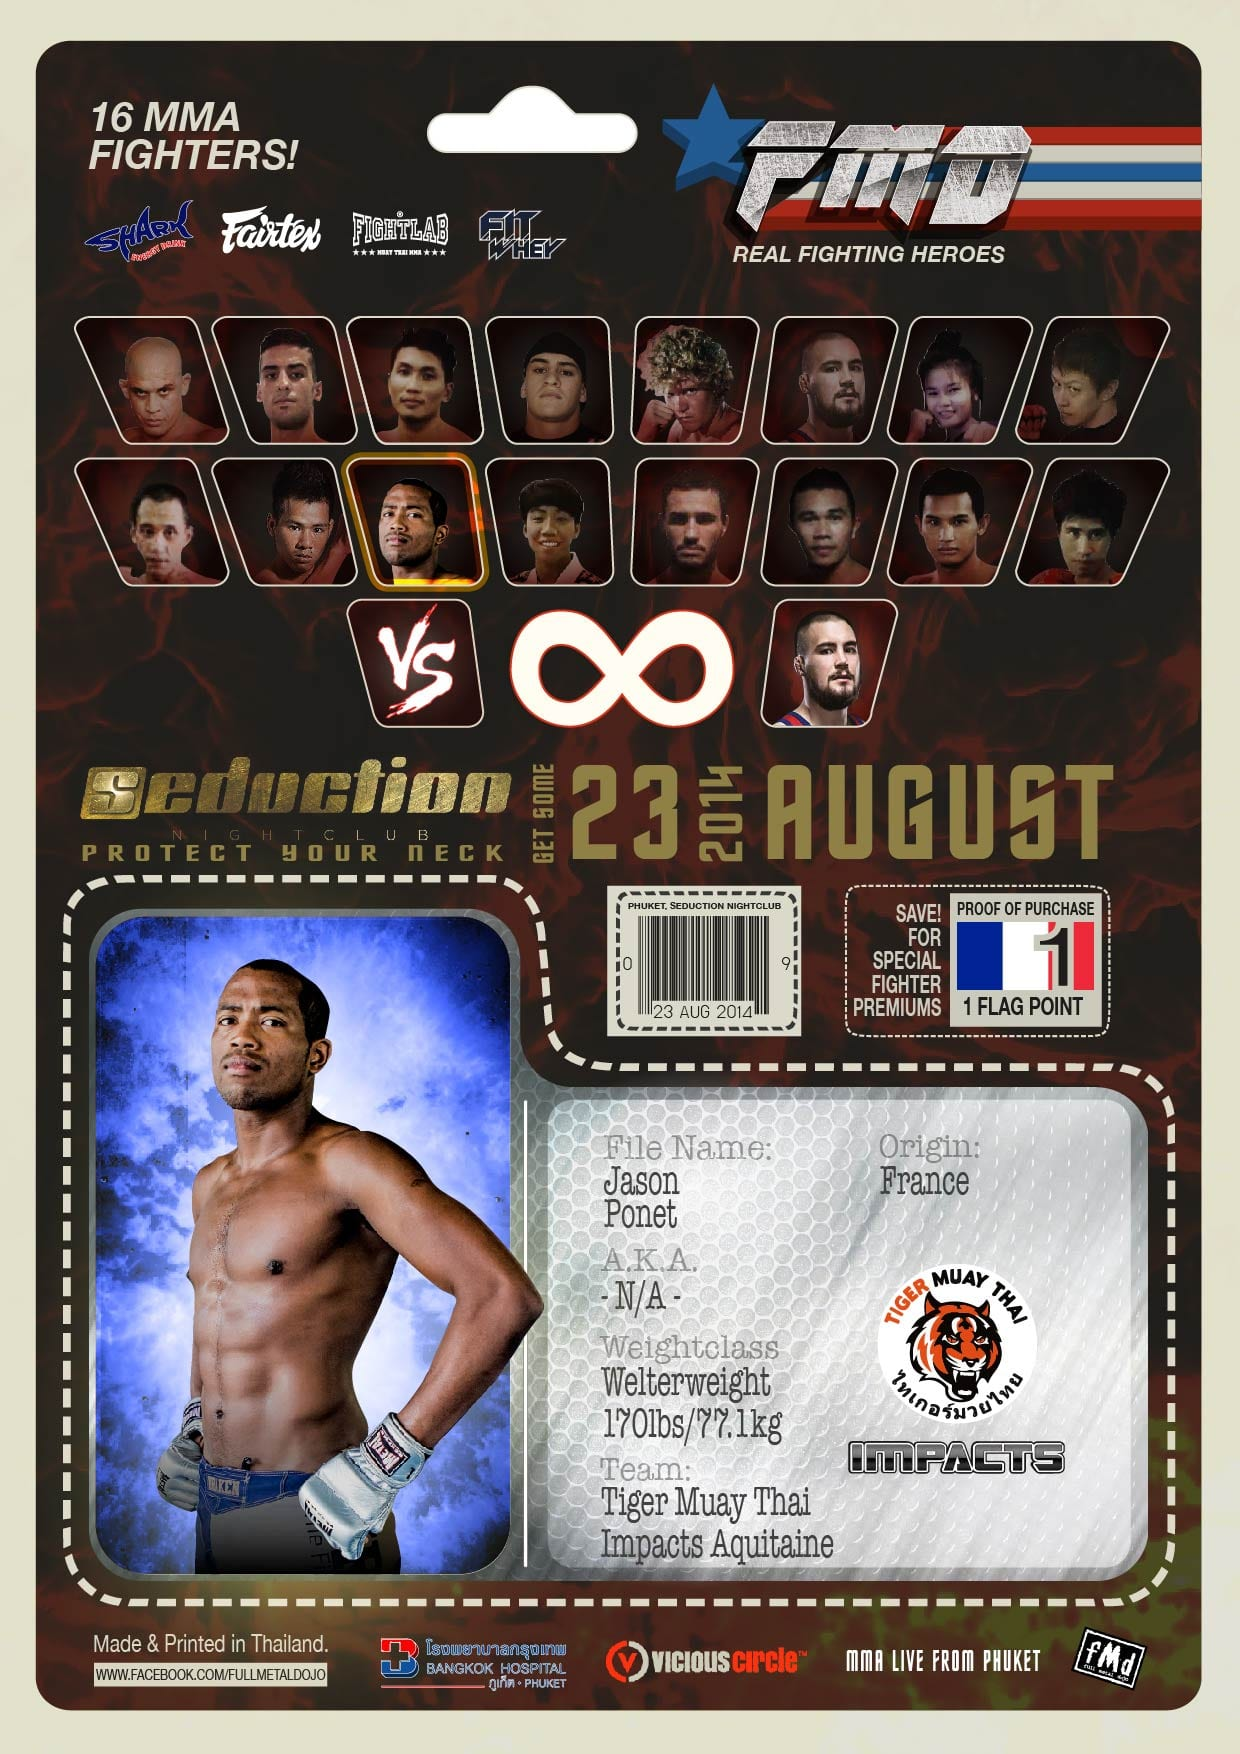 Jason Ponet FMD2 MMA Fighter Profile